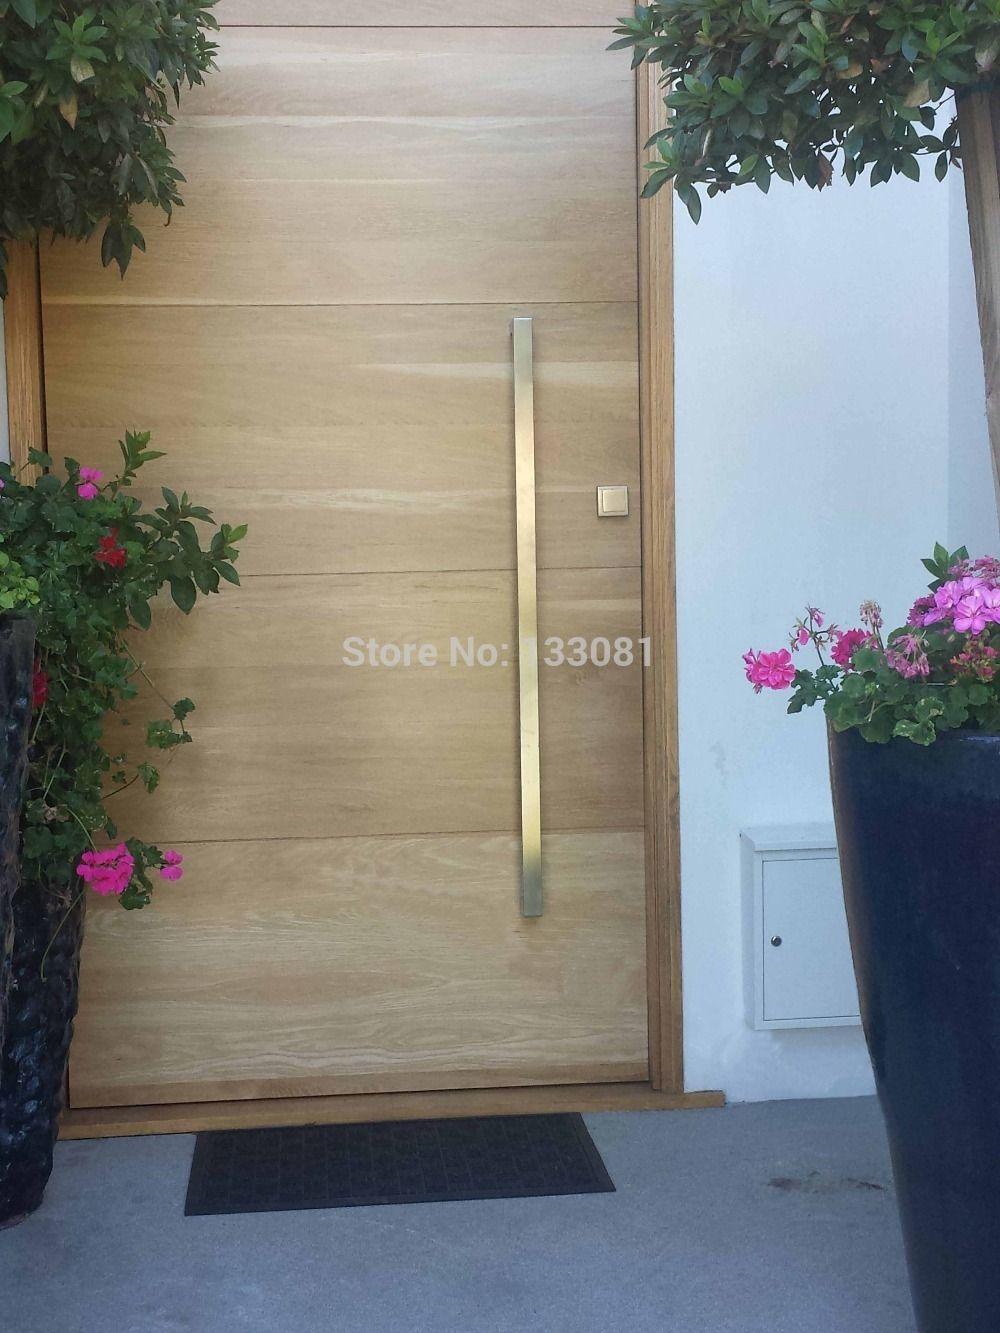 Env o gratis manija de puerta para madera push hogar for Manijas para puertas de madera